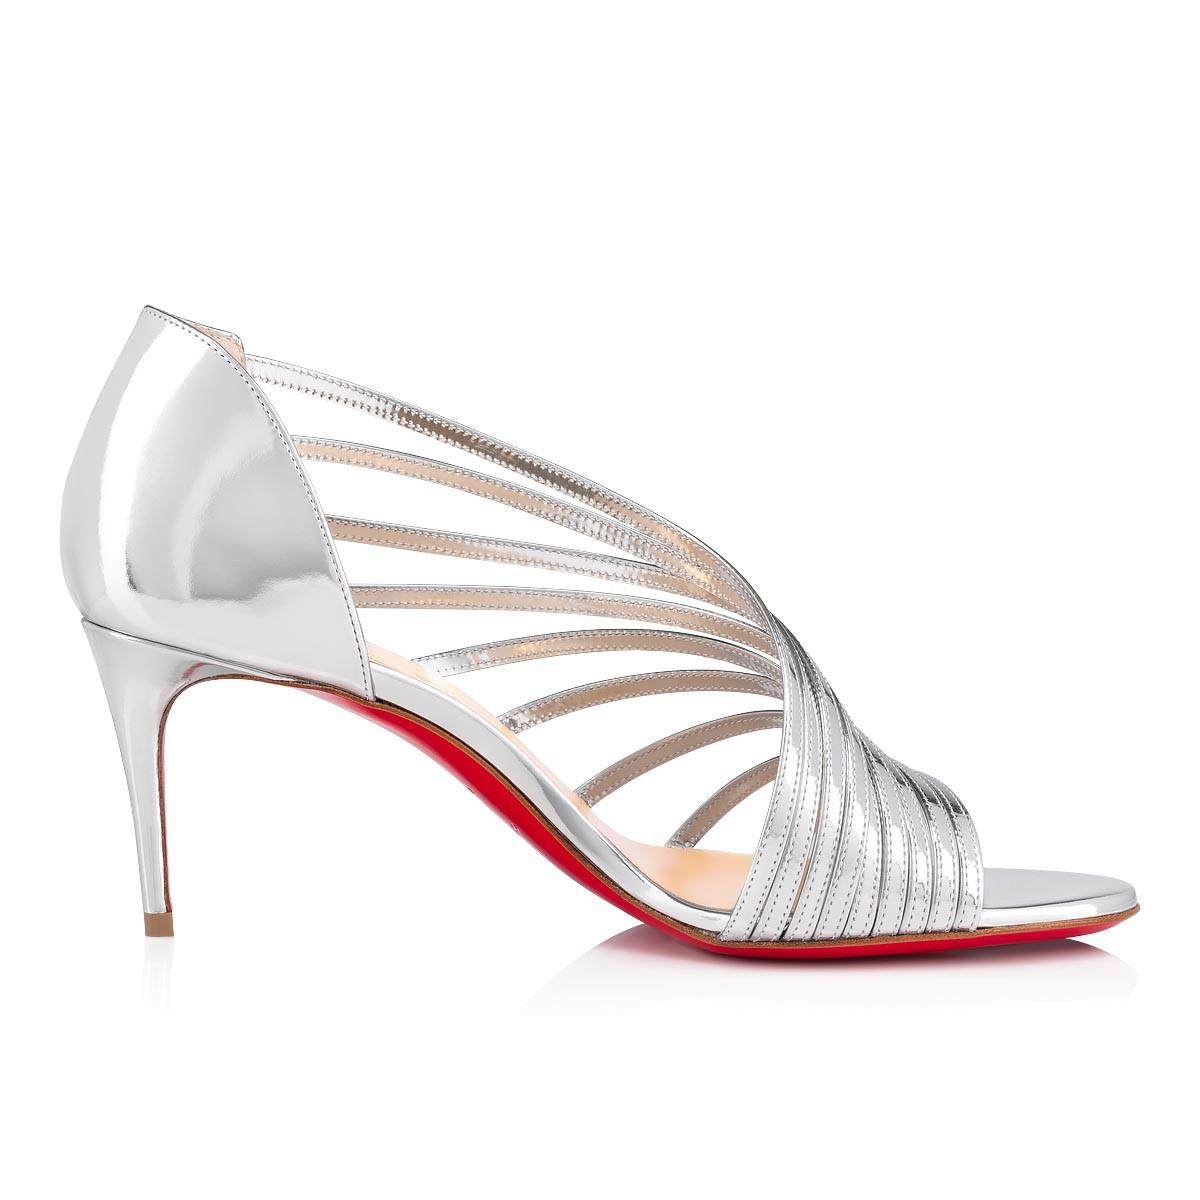 鞋履 - Norina Specchio/laminato - Christian Louboutin